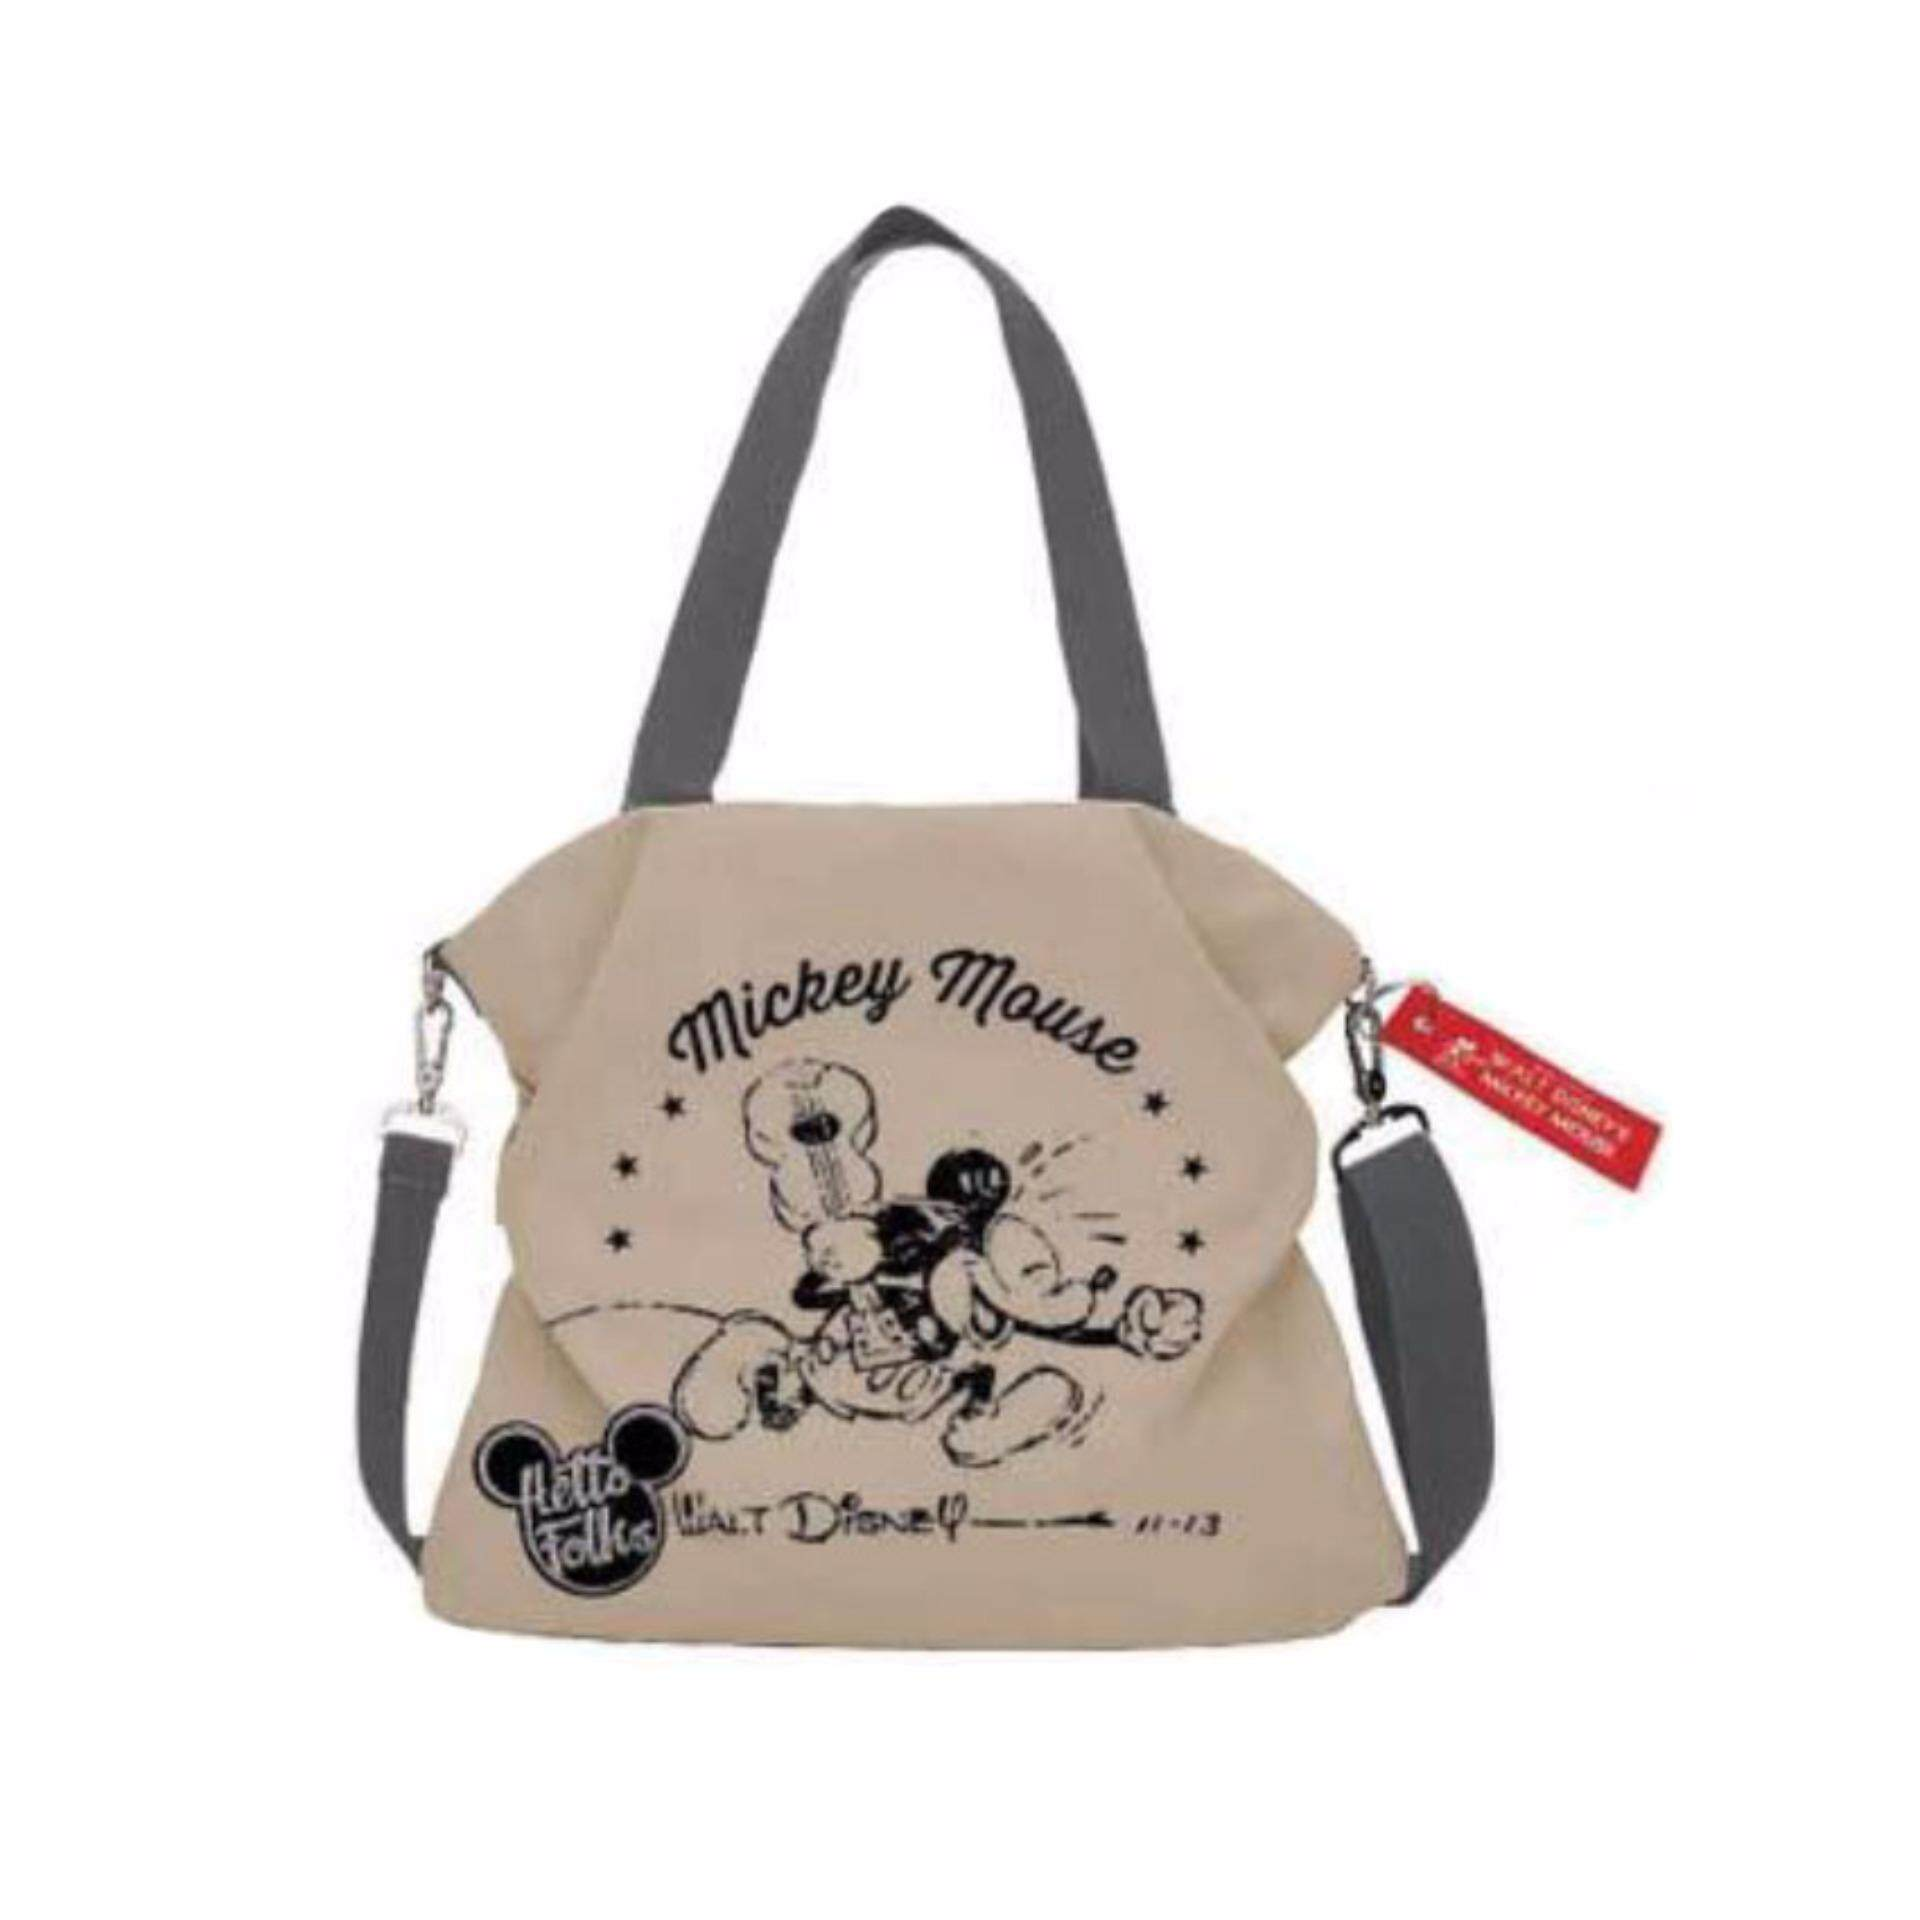 Disney Mickey Adult Two Ways Tote Bag - Hello Folks